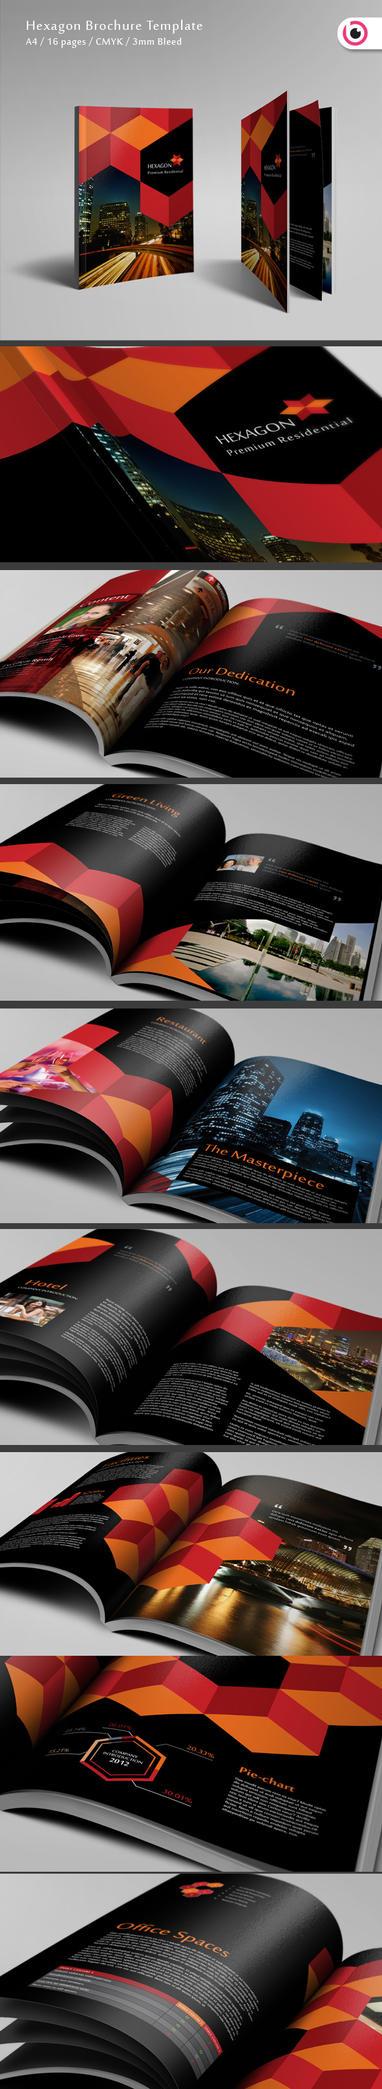 Hexagon Brochure by TonyB3